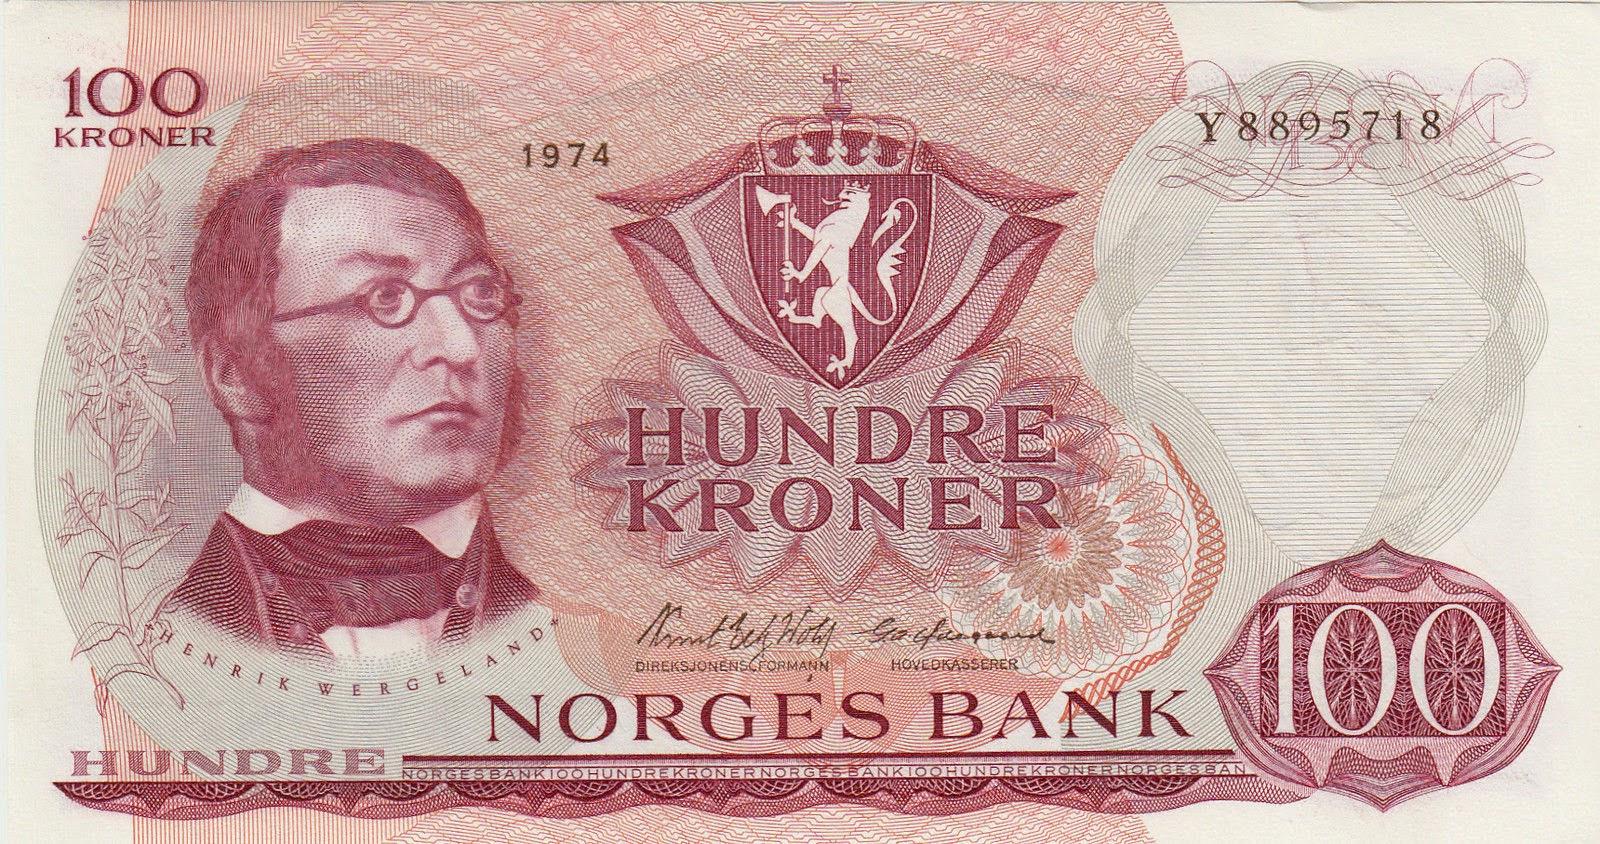 Norway Banknotes 100 Kroner banknote 1974 Henrik Wergeland